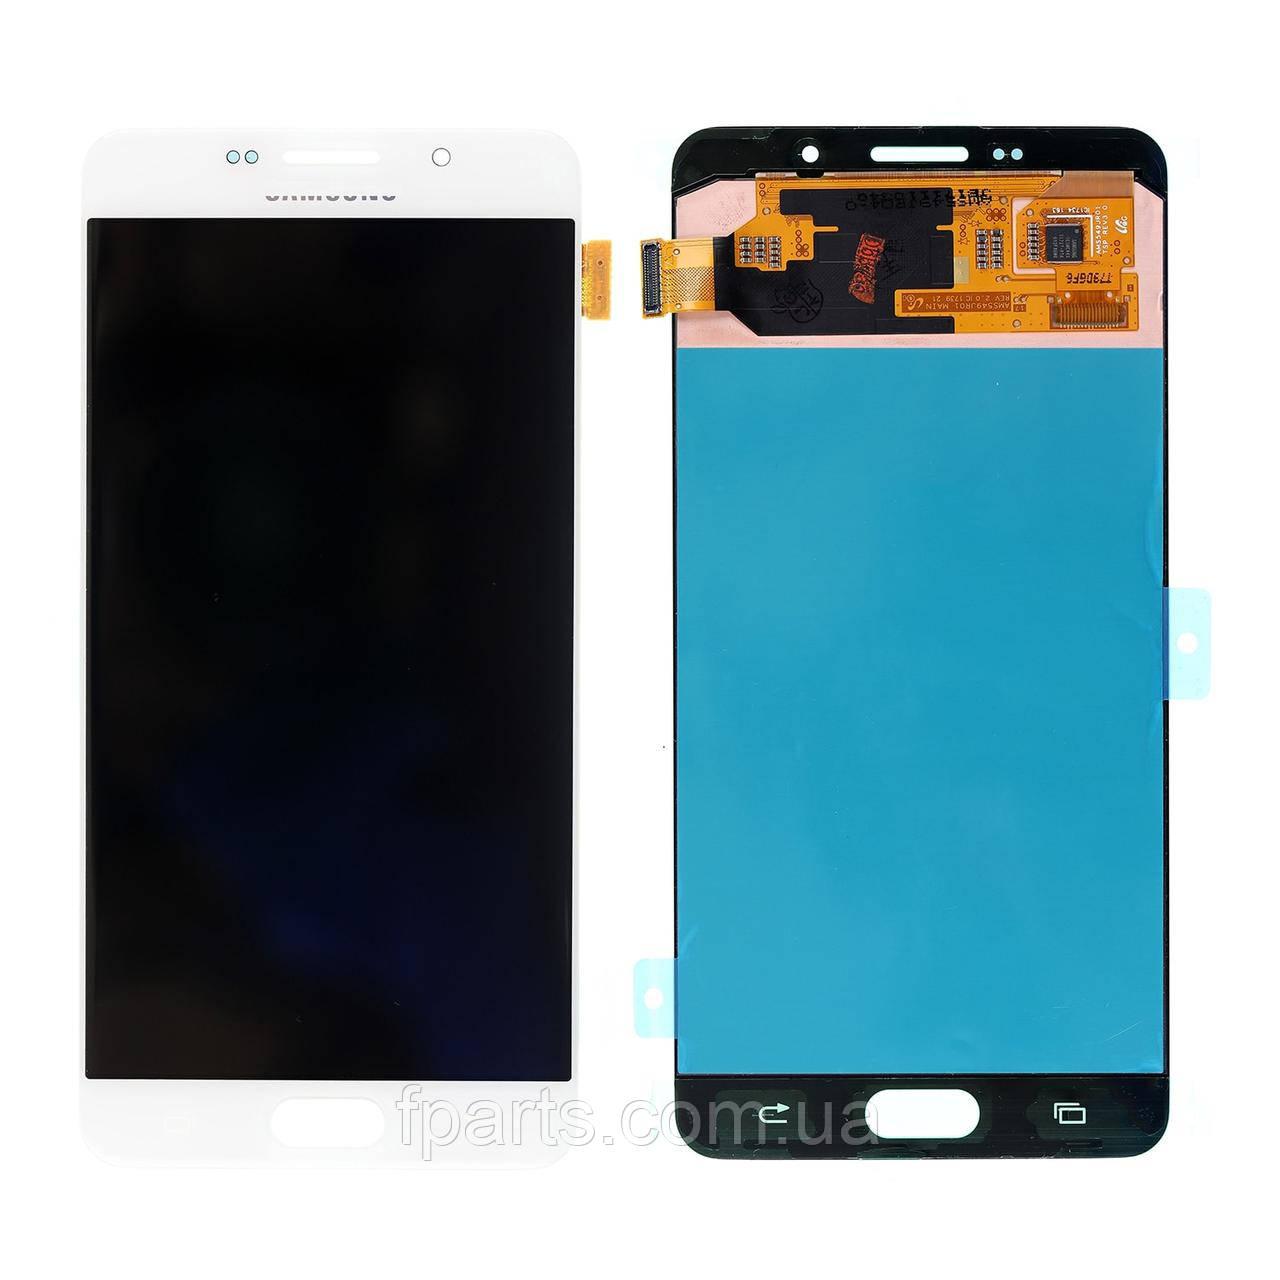 Дисплей для Samsung A710 Galaxy A7 2016 с тачскрином, White (Service Pack Original)